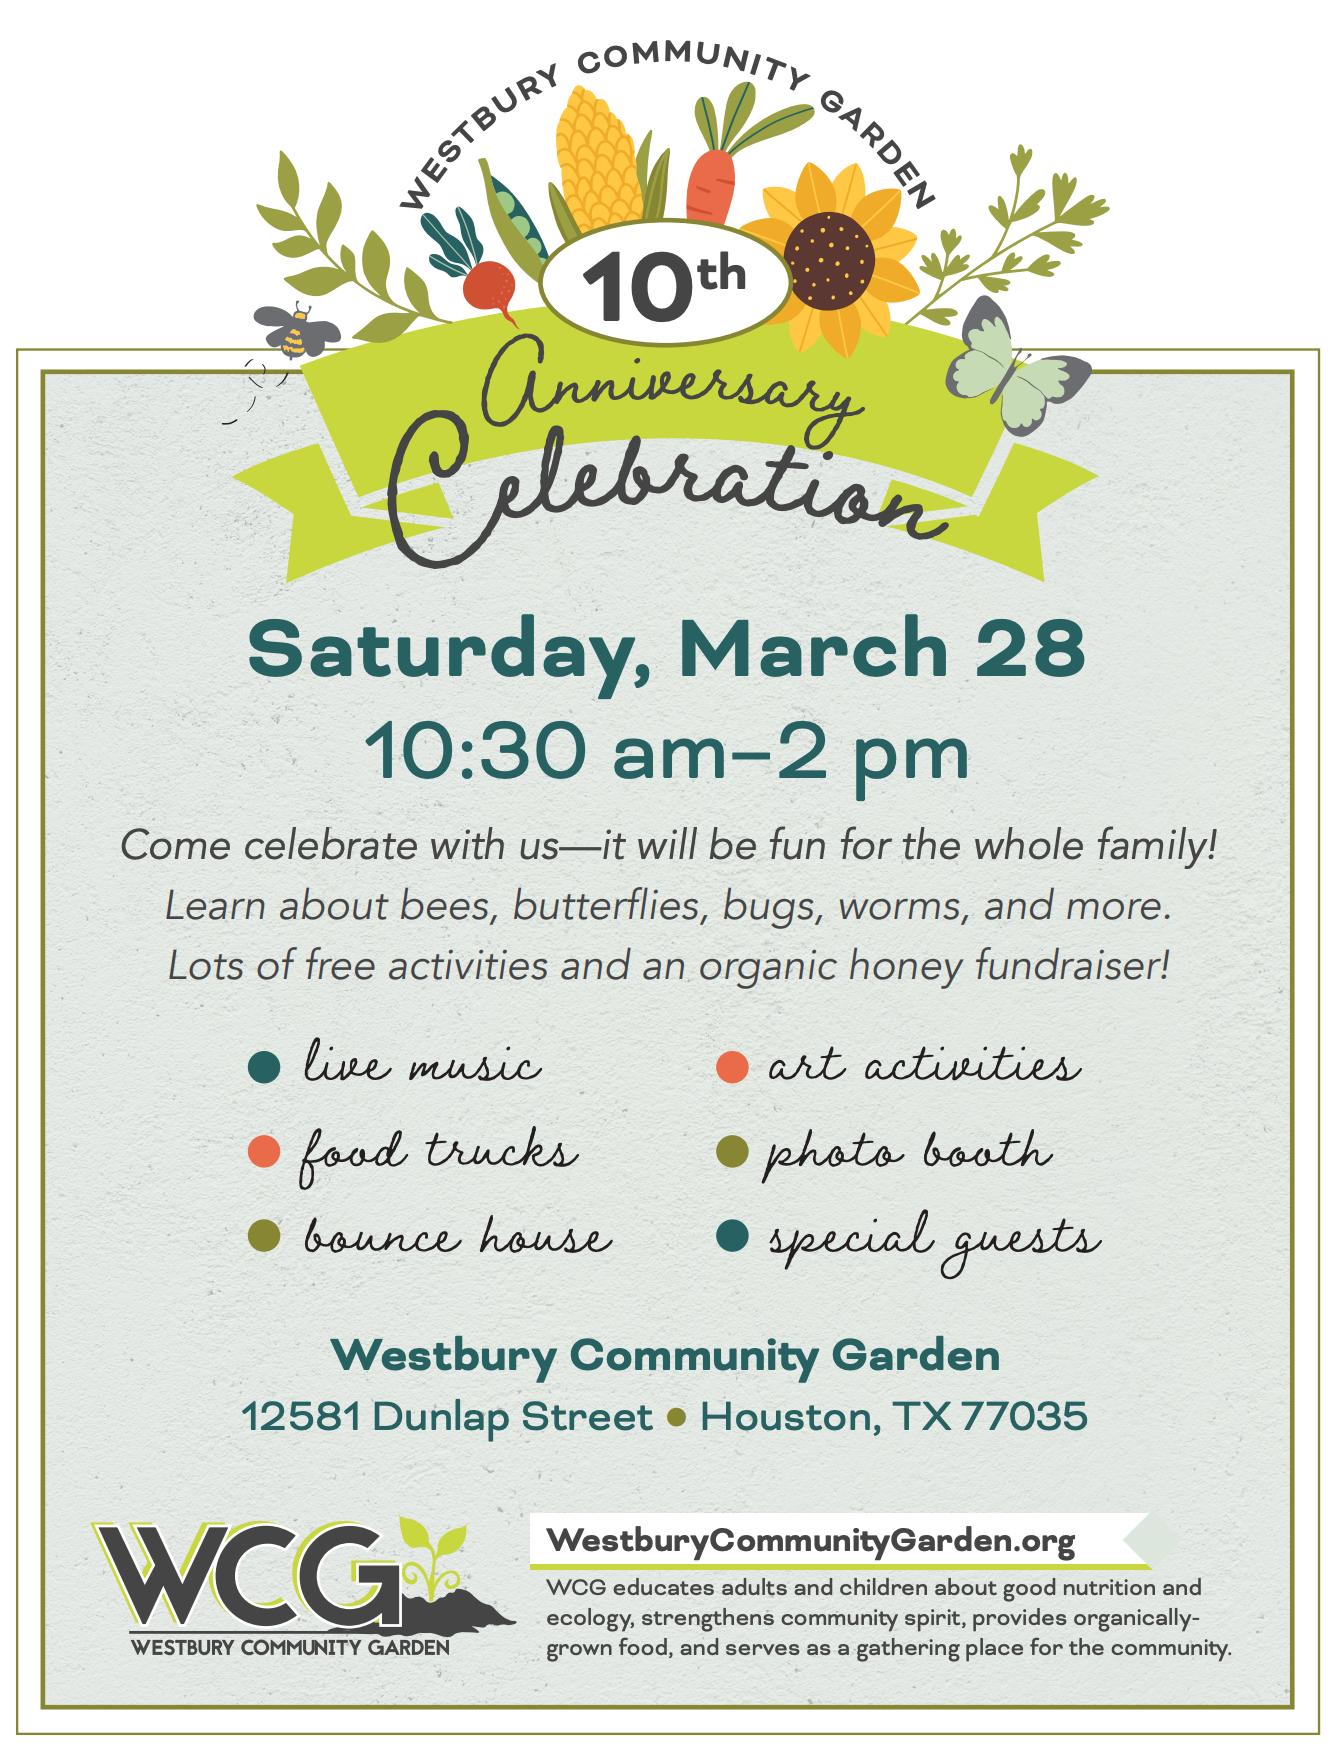 WCG_10th_Celebration_anniversary_flyer